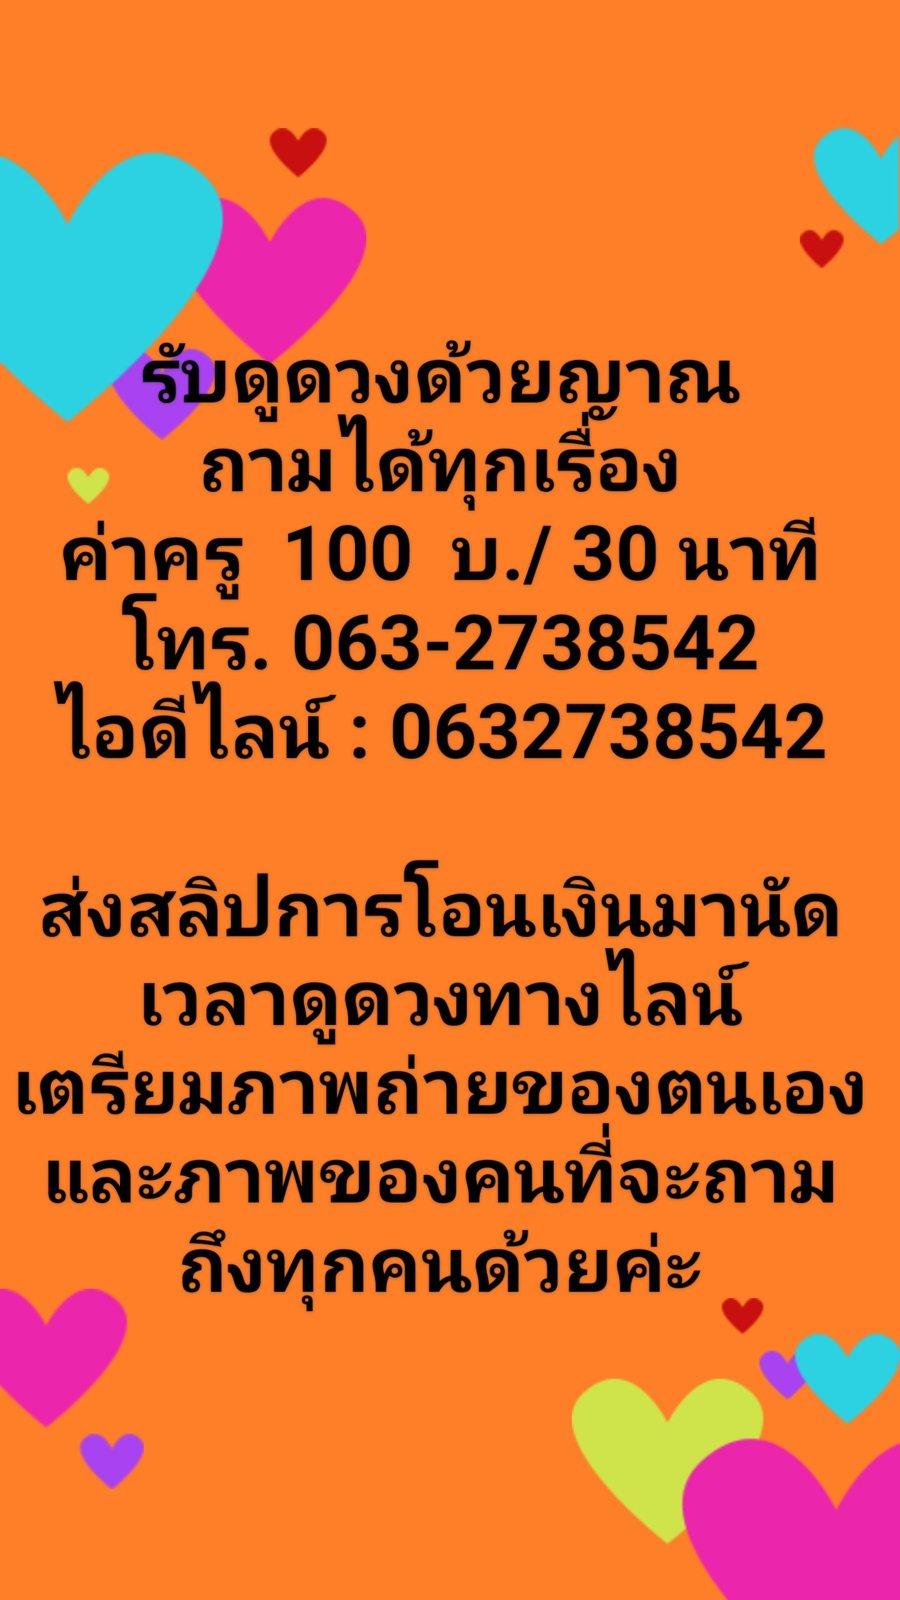 orca-image-1511355156947.jpg_1511355157097.jpeg